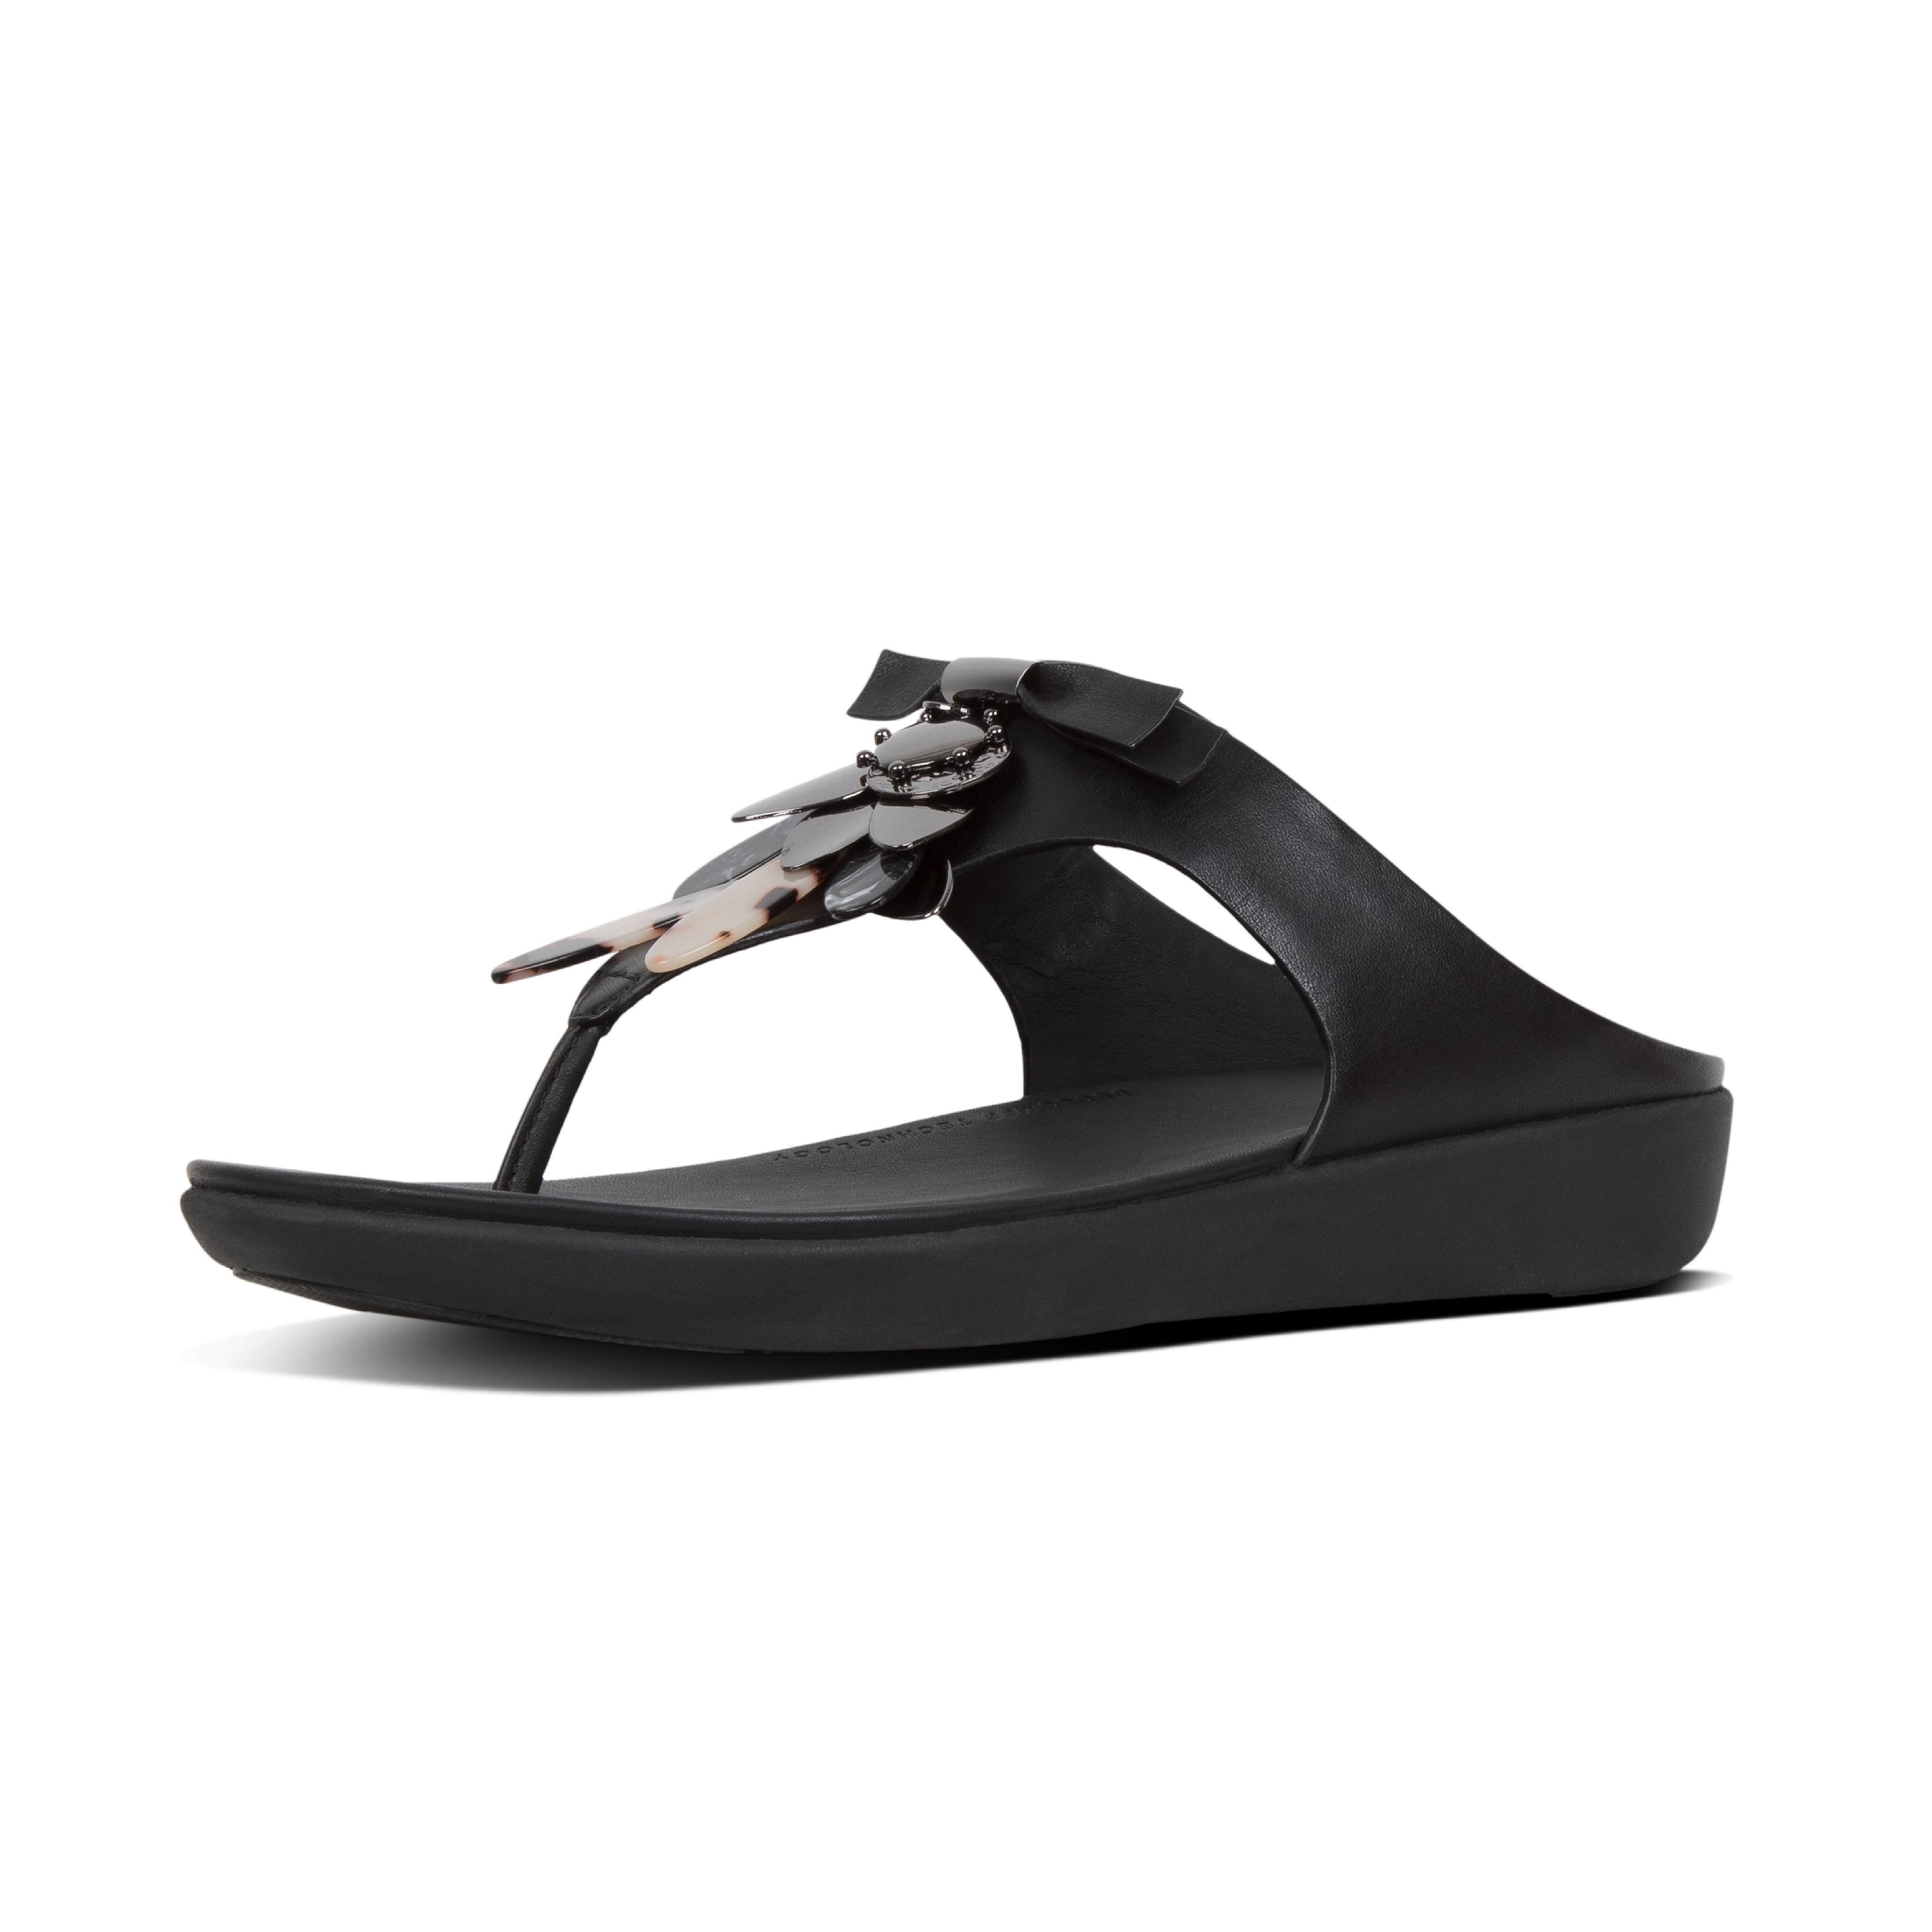 Banda dragonfly leather toe post black r83 001?v=3